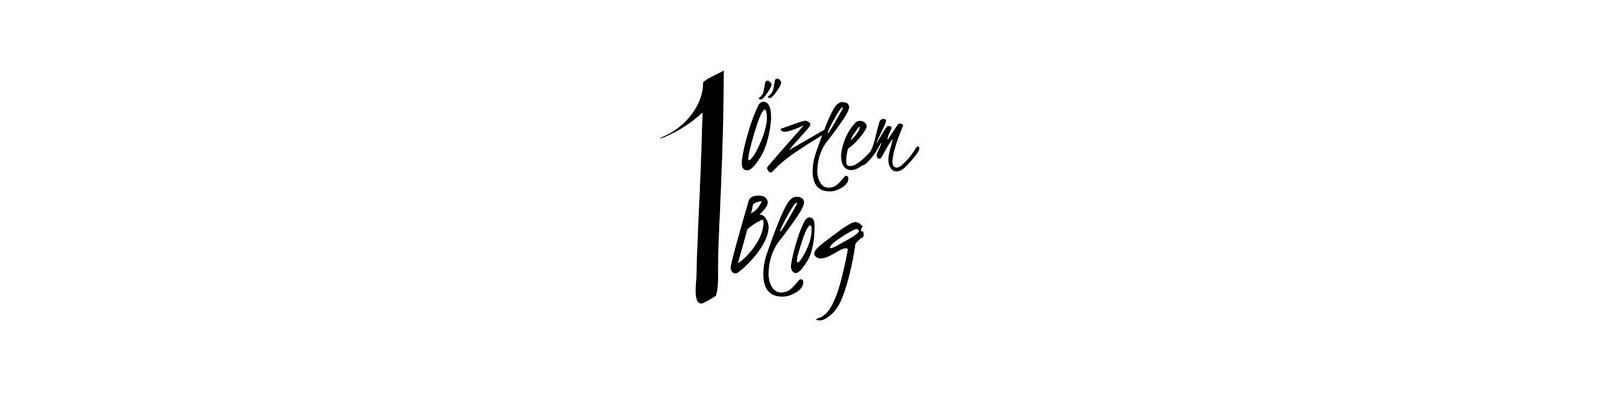 Bir Özlem Bir Blog